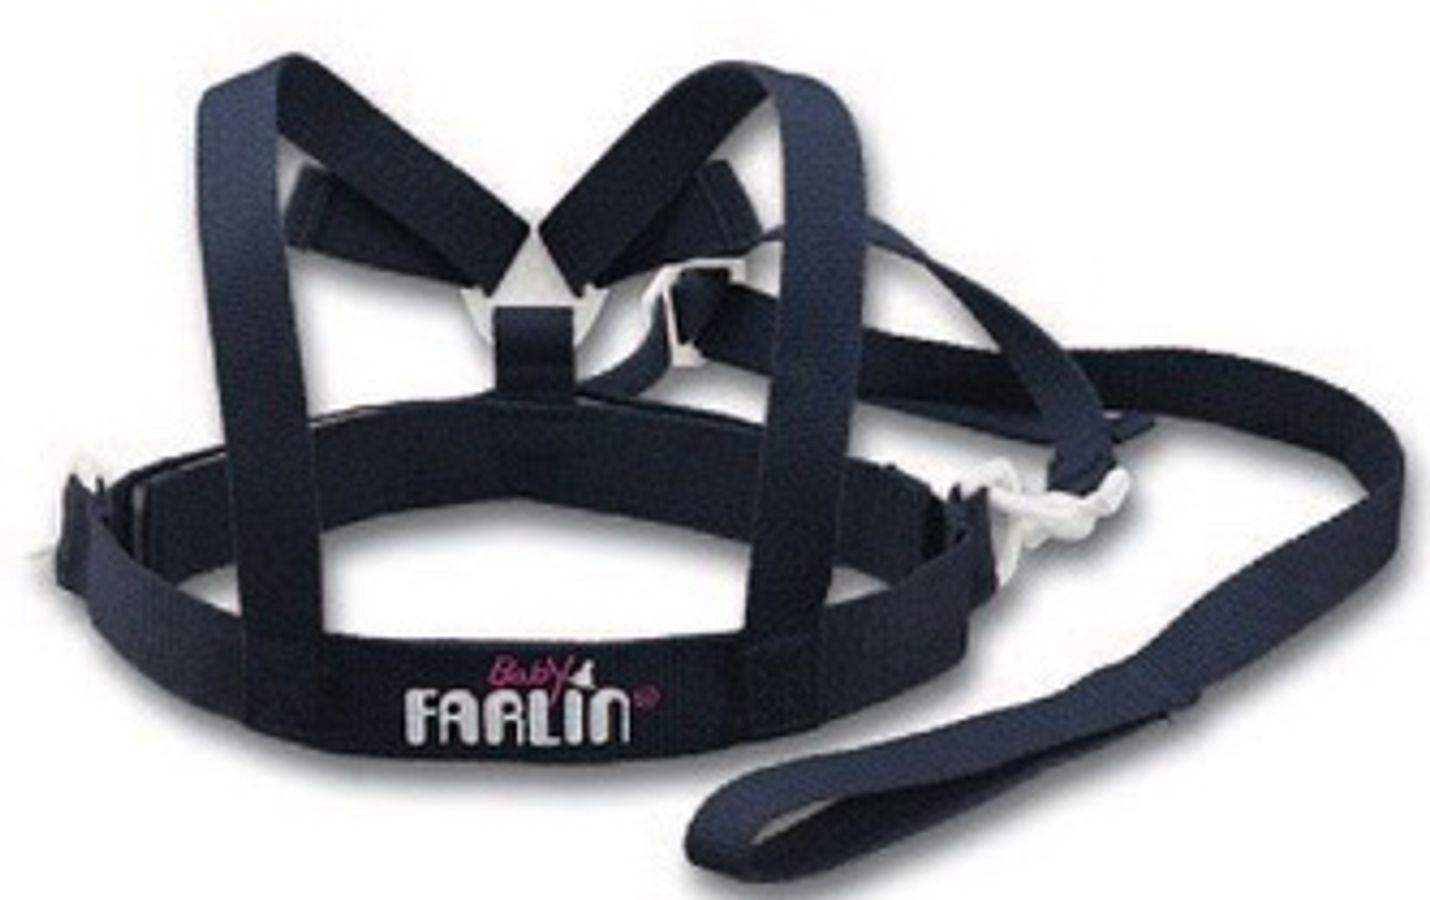 Đai Tập Đi Cho Bé Farlin BF500A